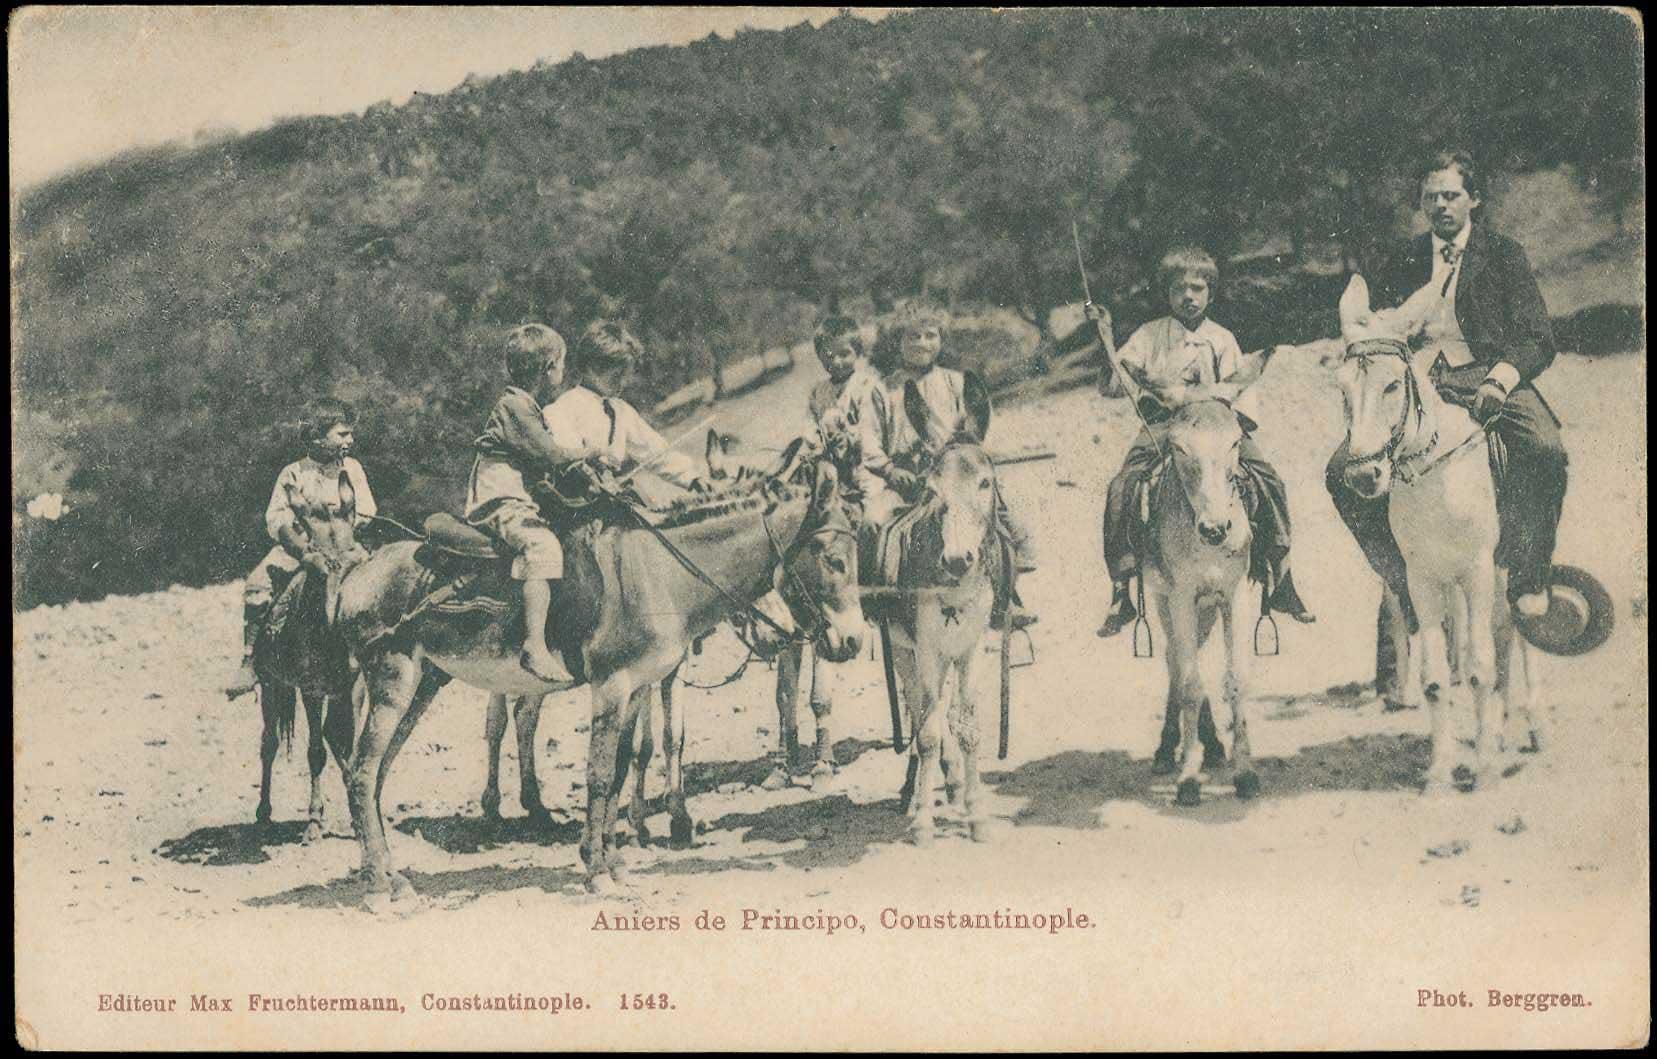 Lot 1766 - -  PICTURE POSTCARDS SMYRNE, CONSTANTINOPLE, ASIA MINOR -  A. Karamitsos Public & Live Internet Auction 675